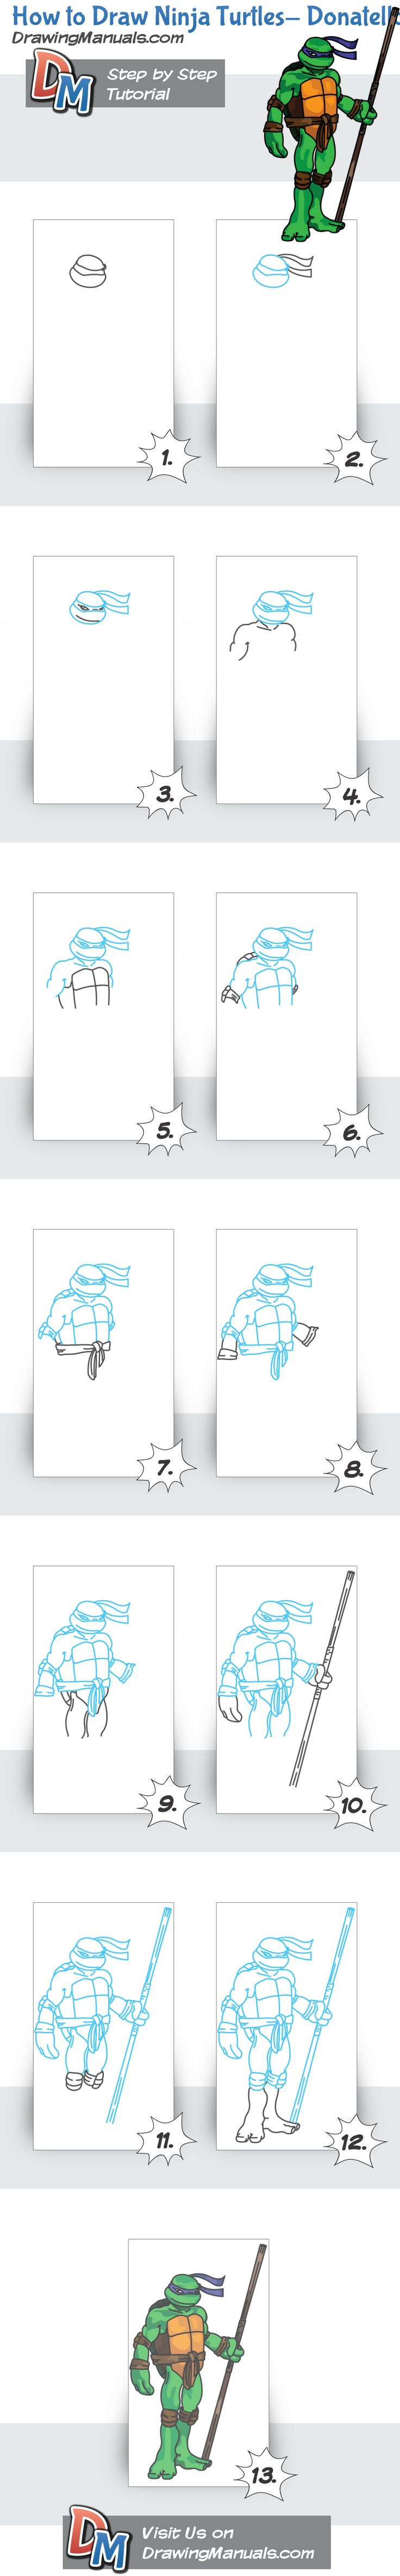 Second tutorial for Ninja Turtle-Donatello http://drawingmanuals.com/manual/how-to-draw-ninja-turtles-donatello/